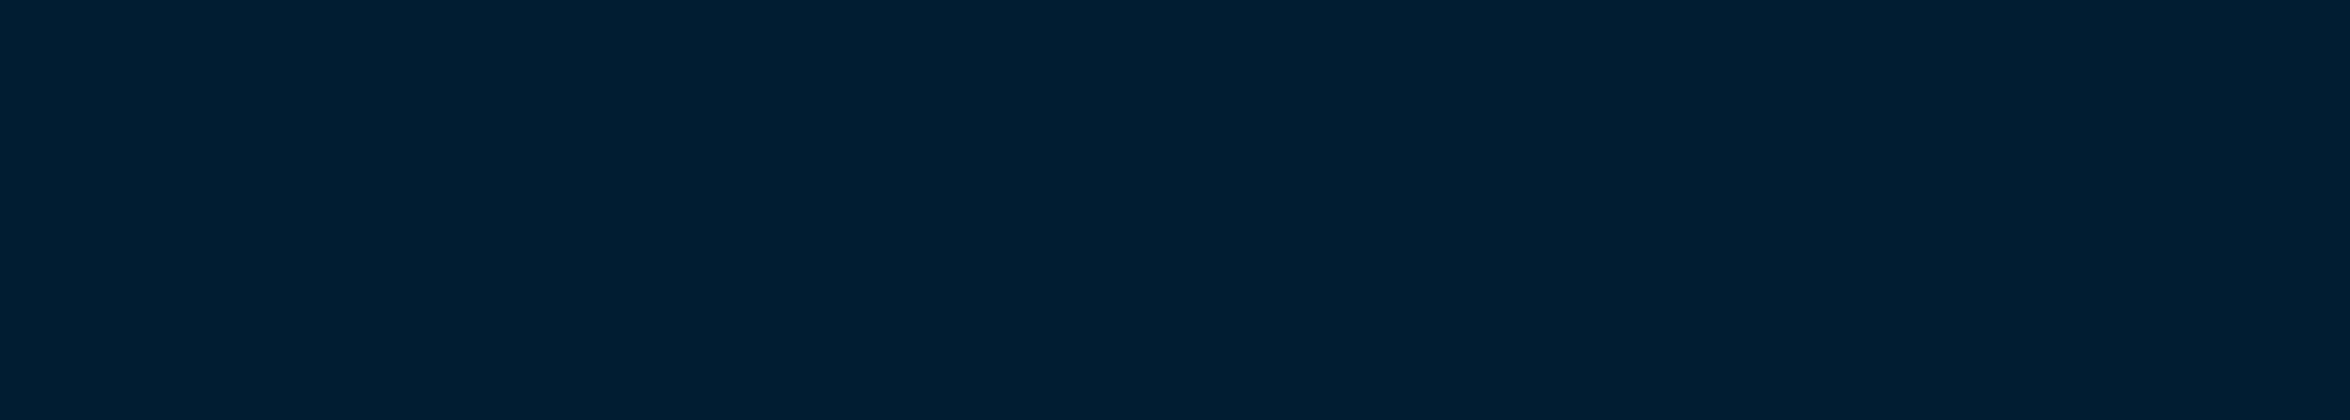 https://www.gmasystem.it/wp-content/uploads/2019/05/blue_gradient.png